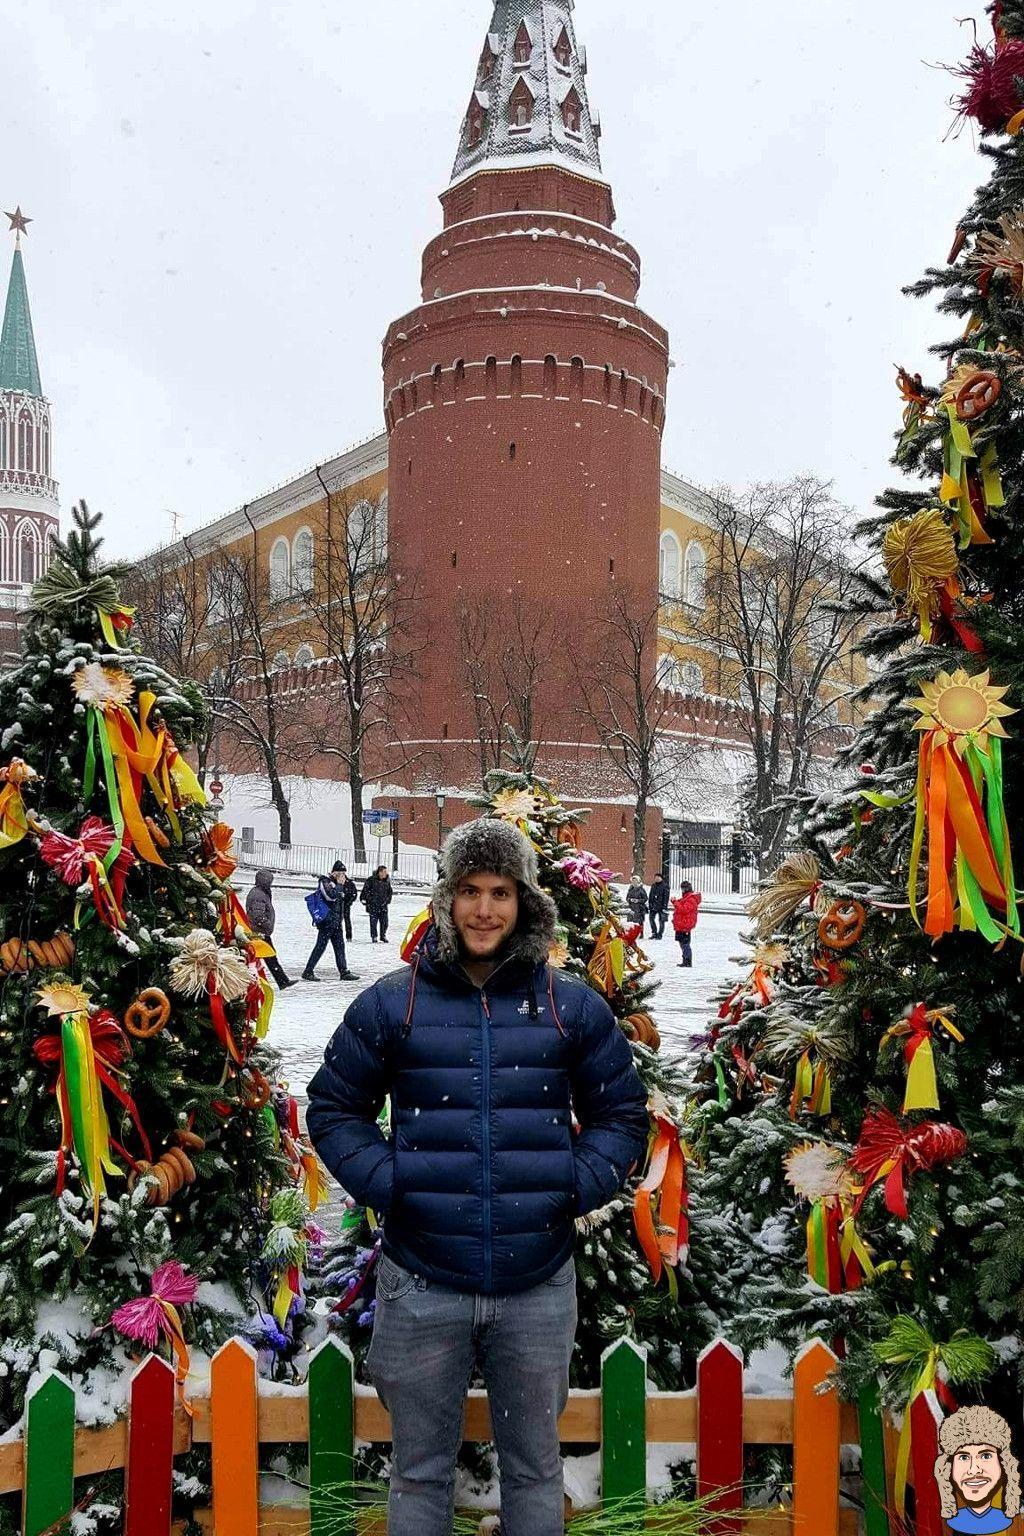 Schwabski, Russland, Russlandreise, Russland Reisen, Schwabski Russland Reisen,St. Petersburg, Moskau, Sibirien, Irkutsk, Baikalsee, Weihnachten, Weihnachten in Russland, Russland Weihnachten